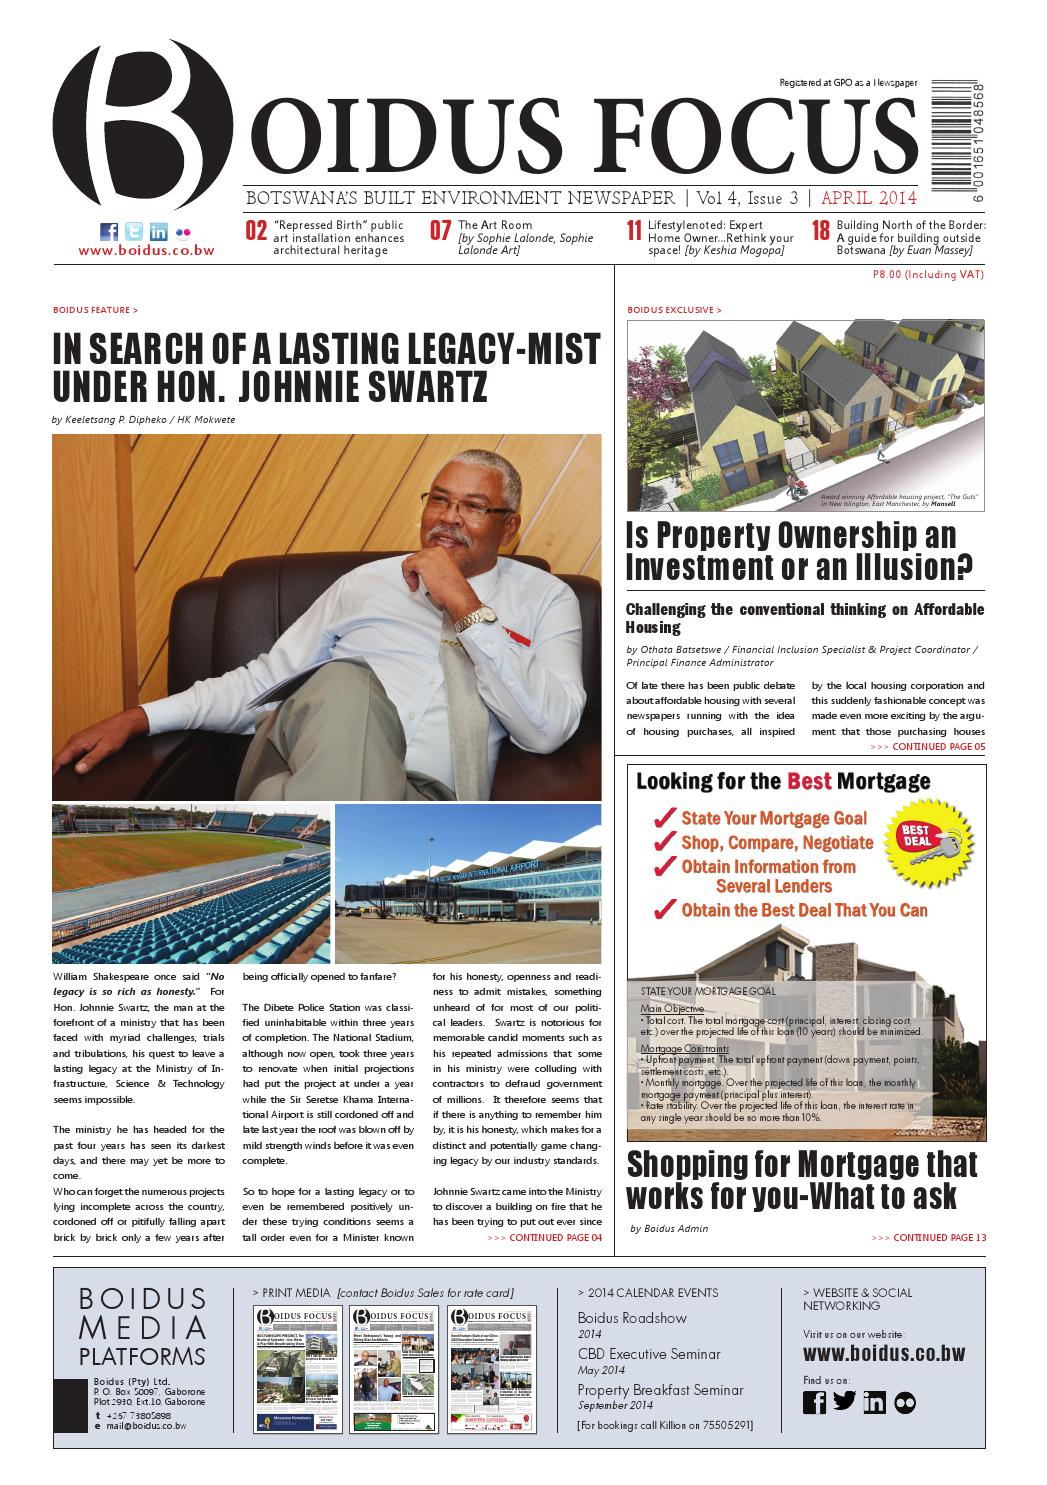 Boidus Focus Vol 4 Issue 3 Apr 2014 By Boidus Botswana Issuu